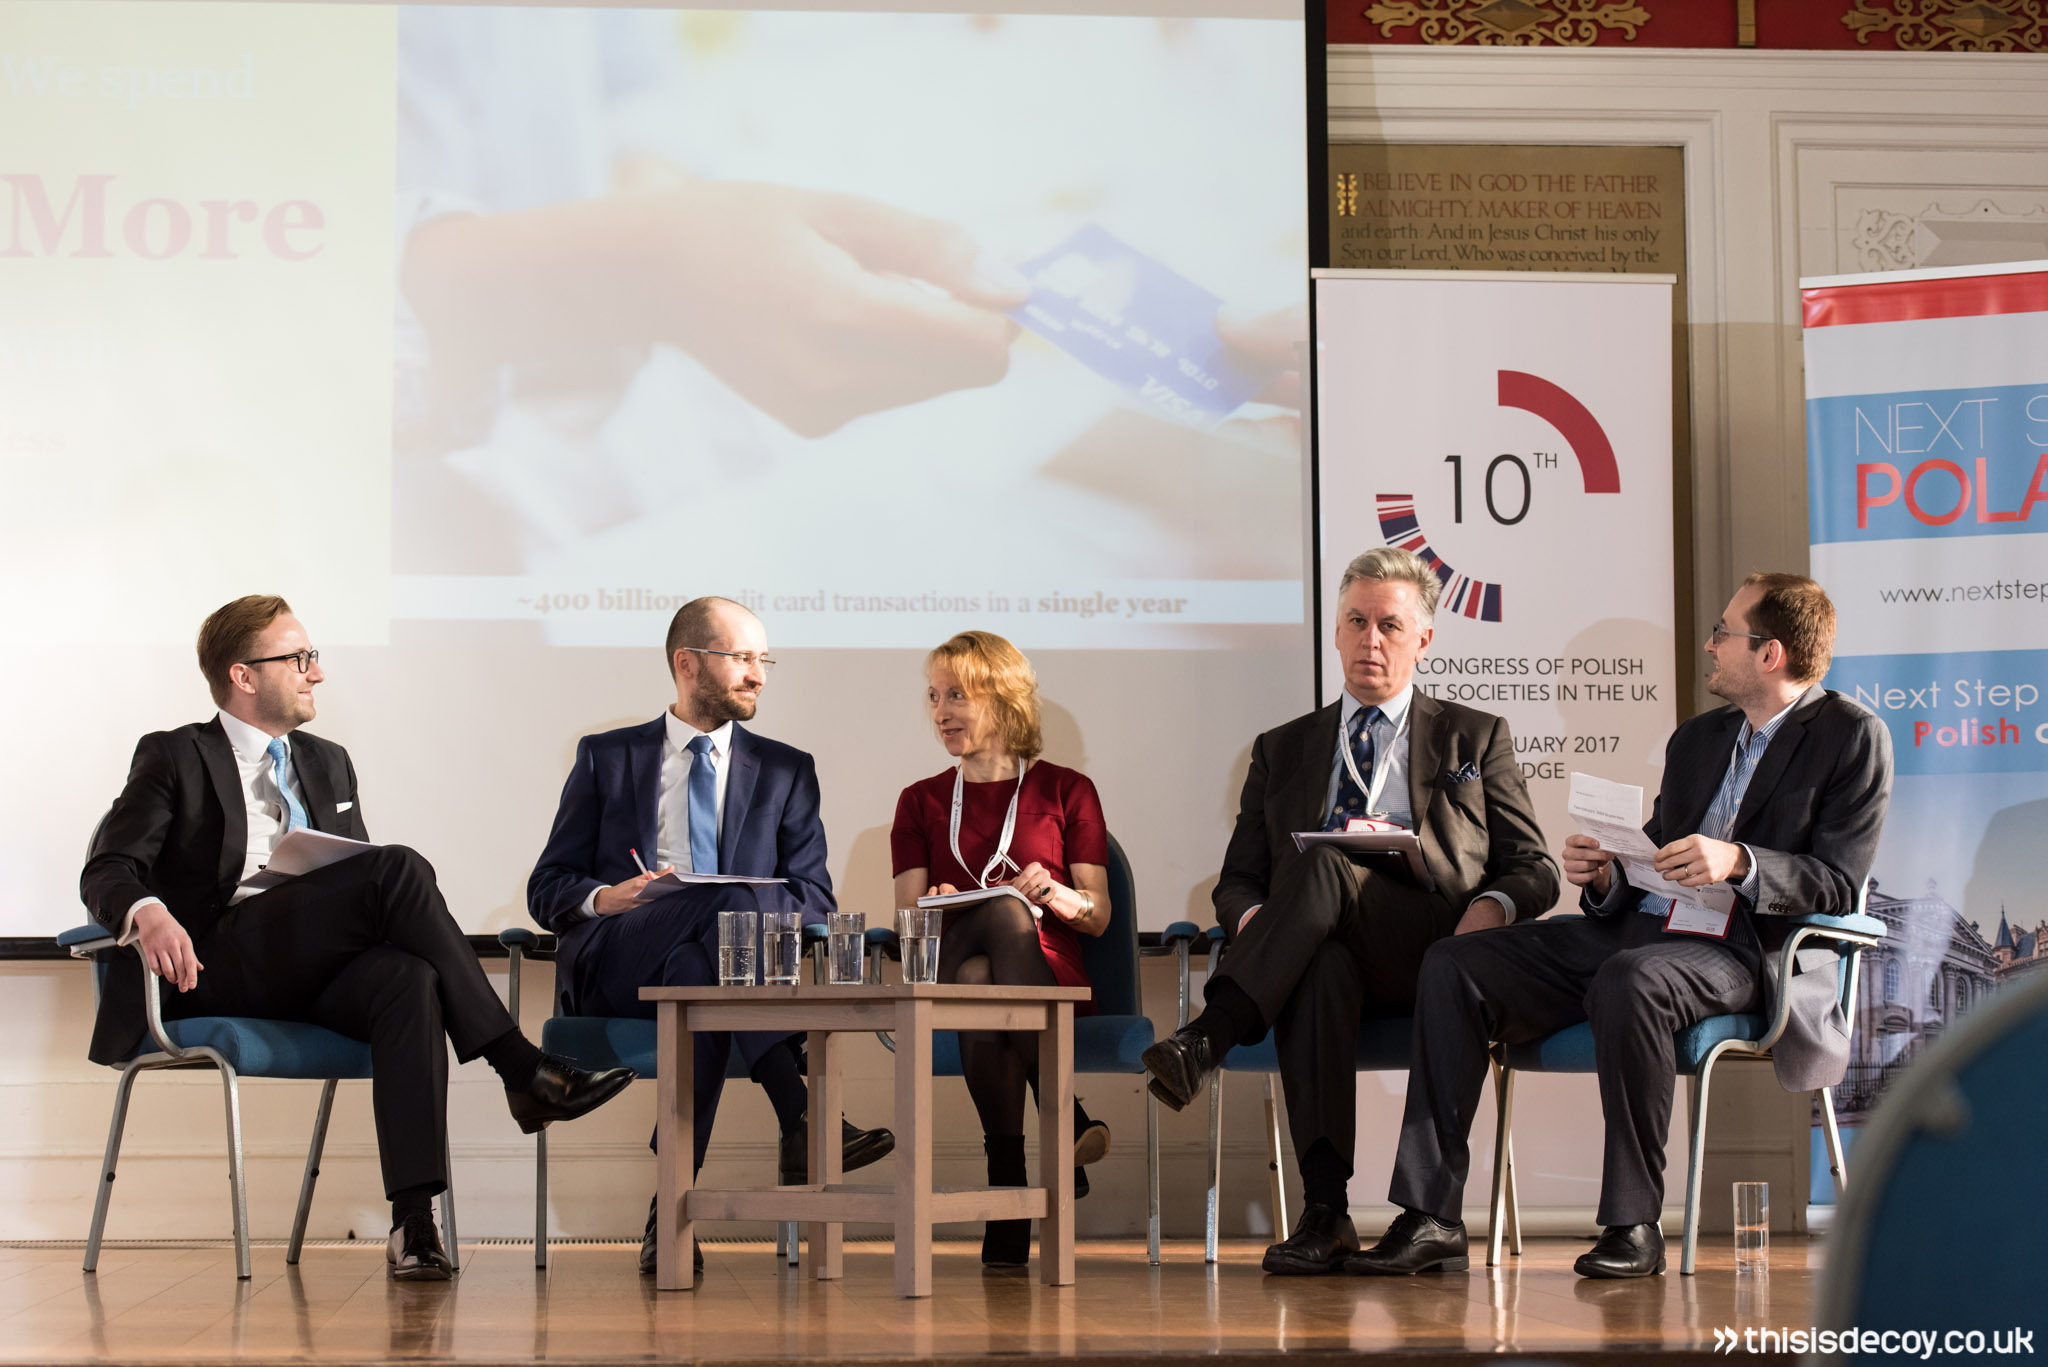 Polish Congress of Student Societies in the UK 2017 - Decoy Media - 15.jpg